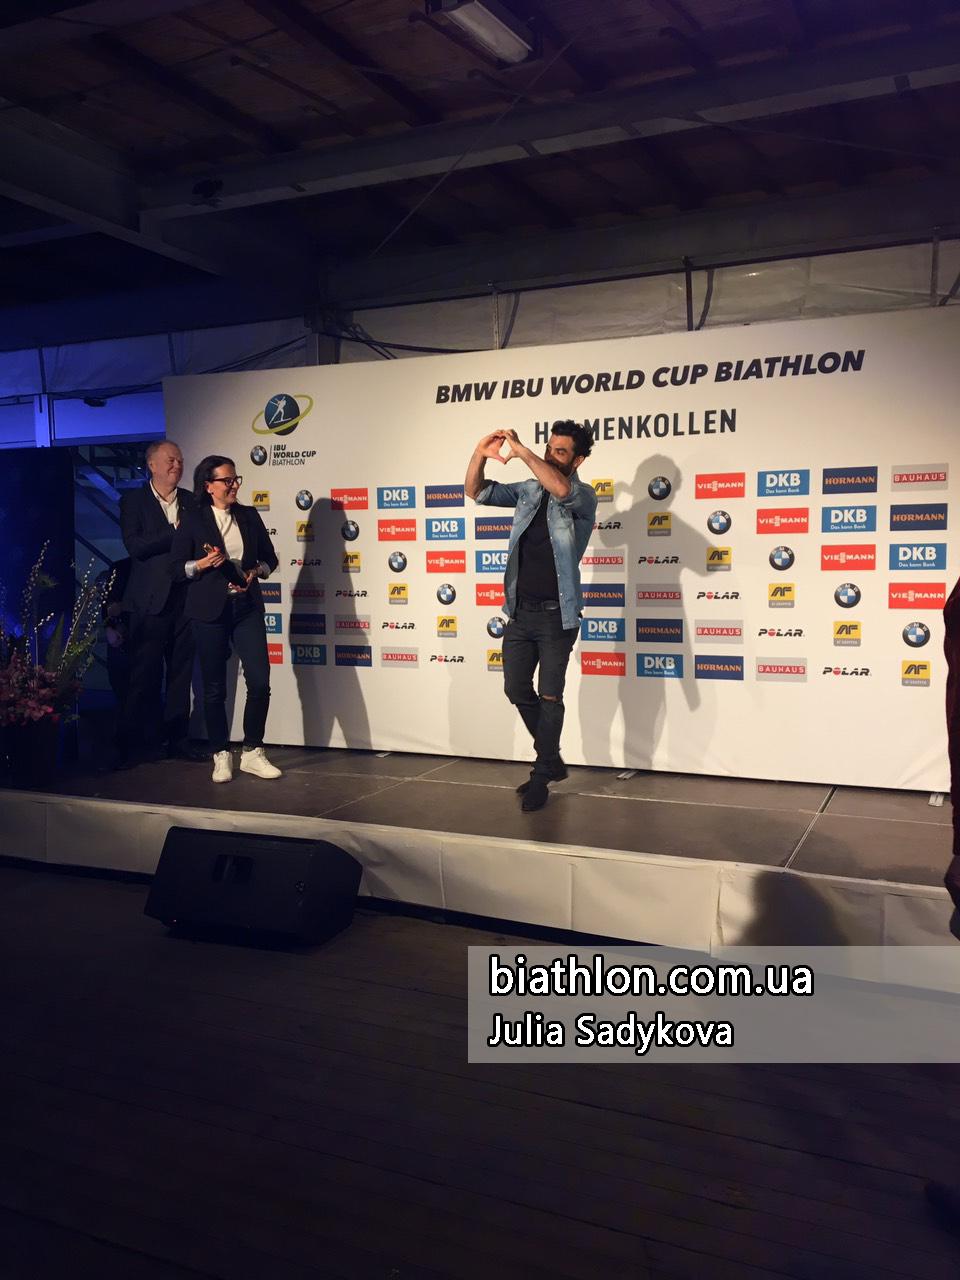 https://www.biathlon.com.ua/uploads/2019/99319.jpg